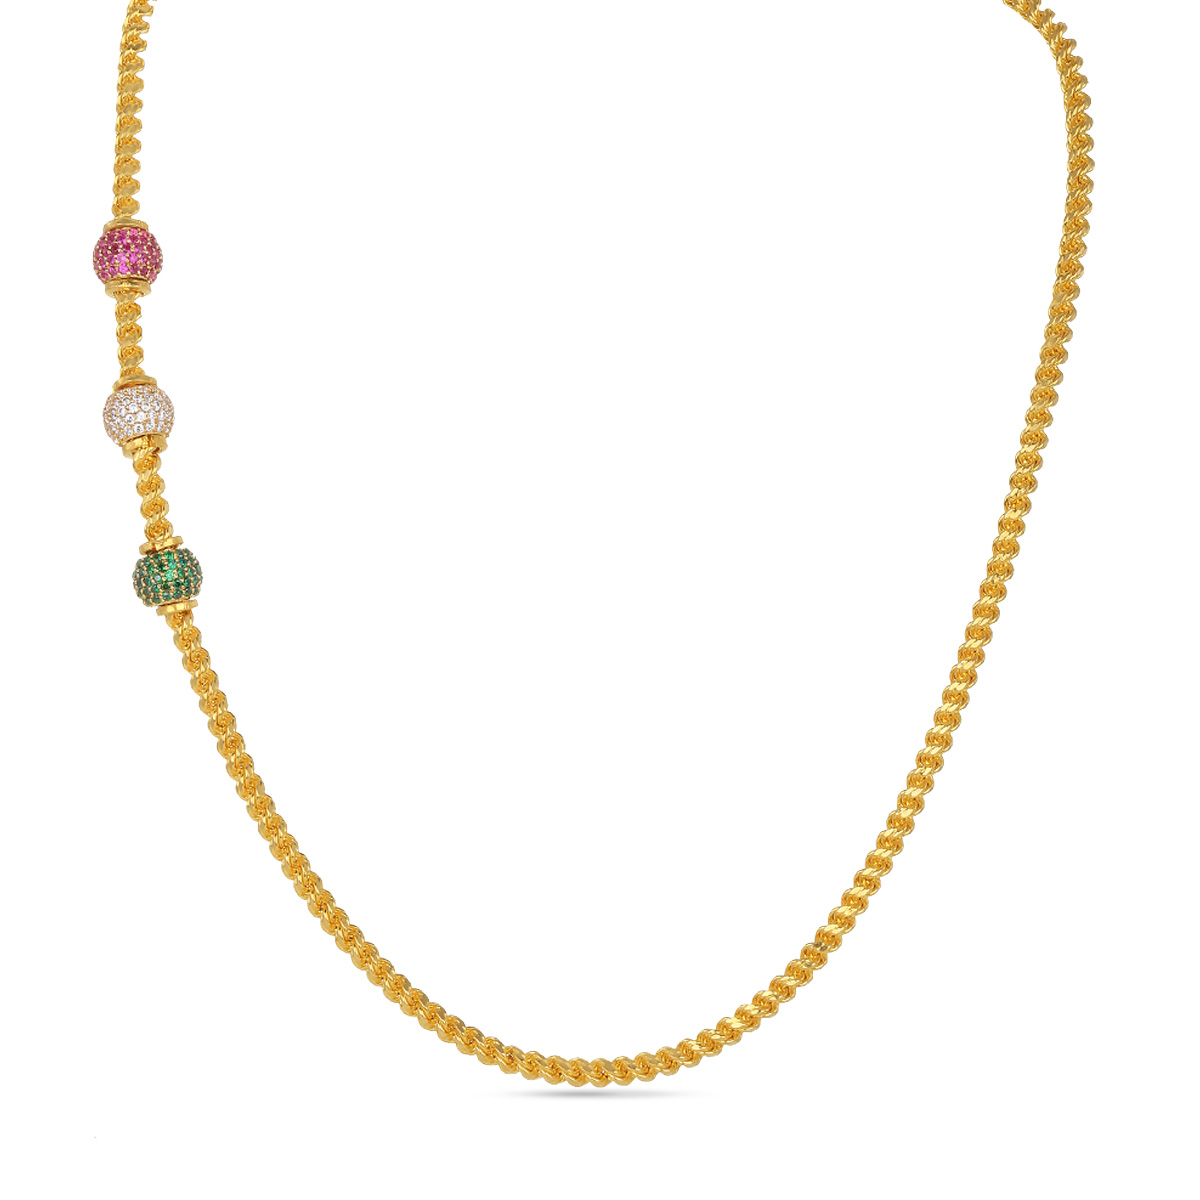 Traditional mugapu chain